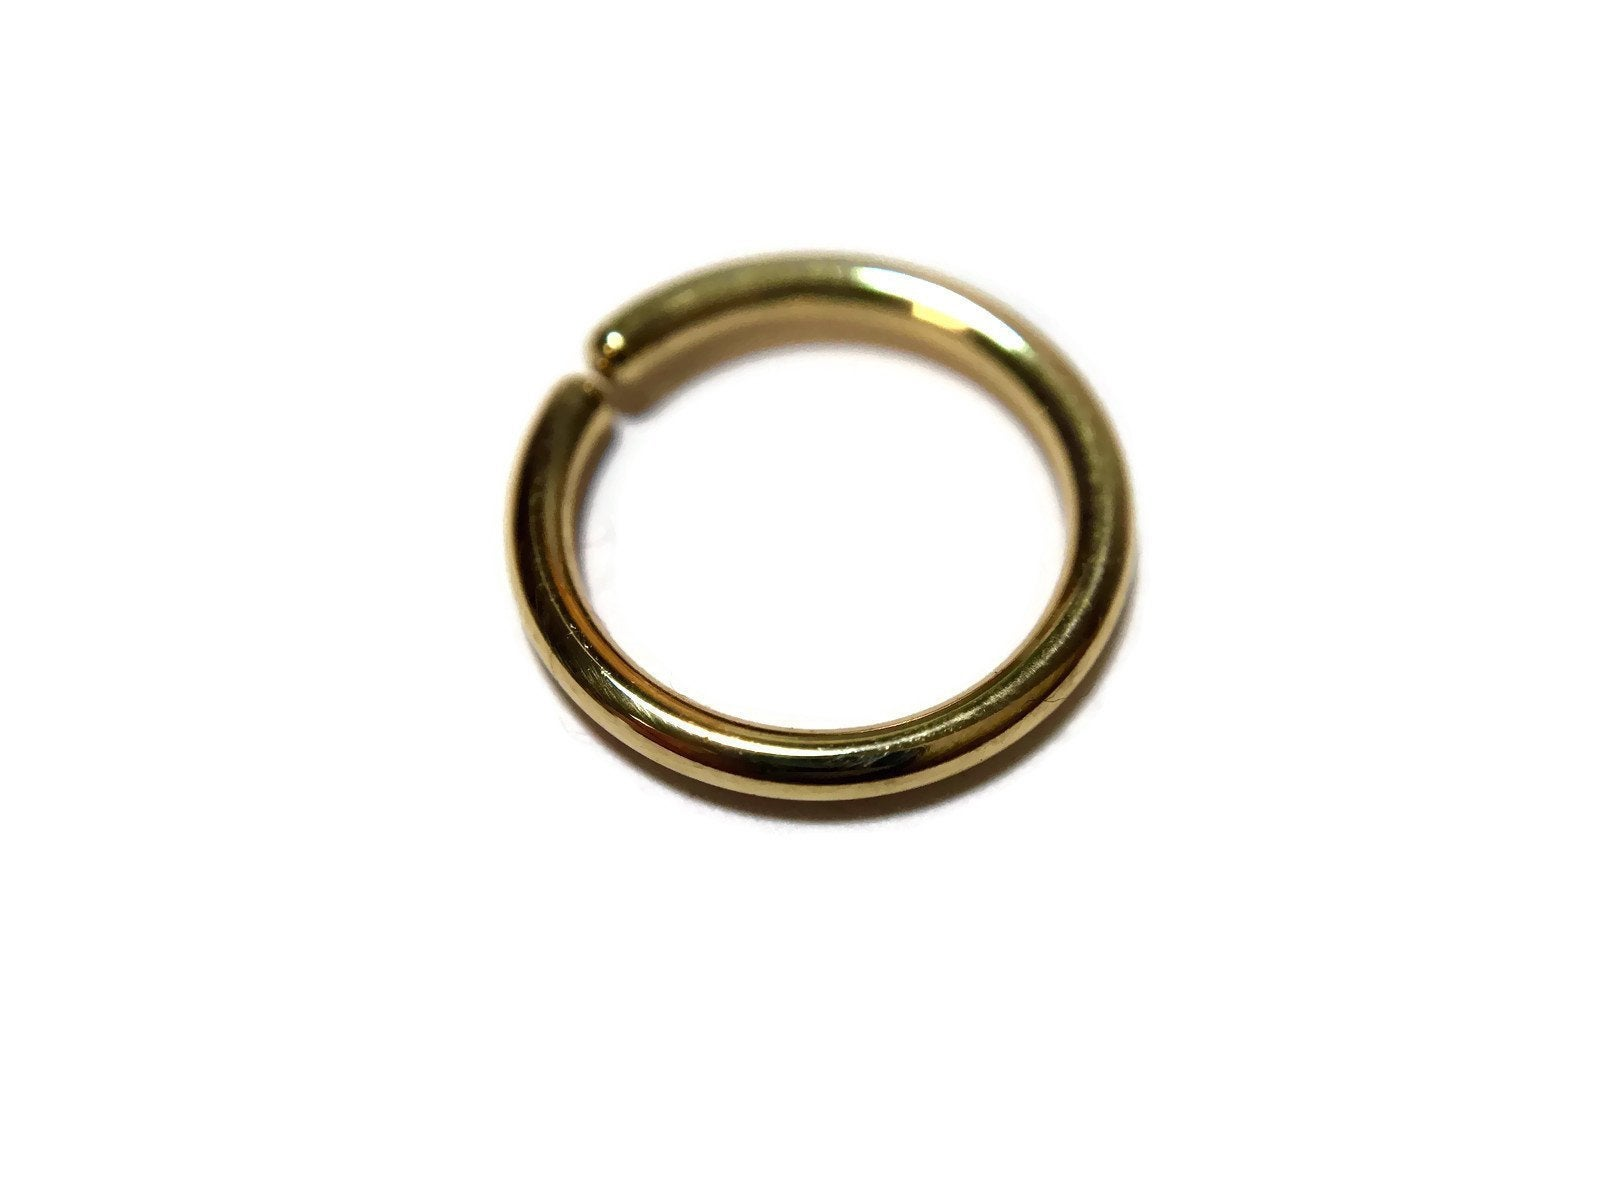 Yellow Gold Seam Ring – Plain Simple Piercing – Septum – Lip – Nostril – Helix – Rook – Daith – Tragus – Conch – Snug – Earring